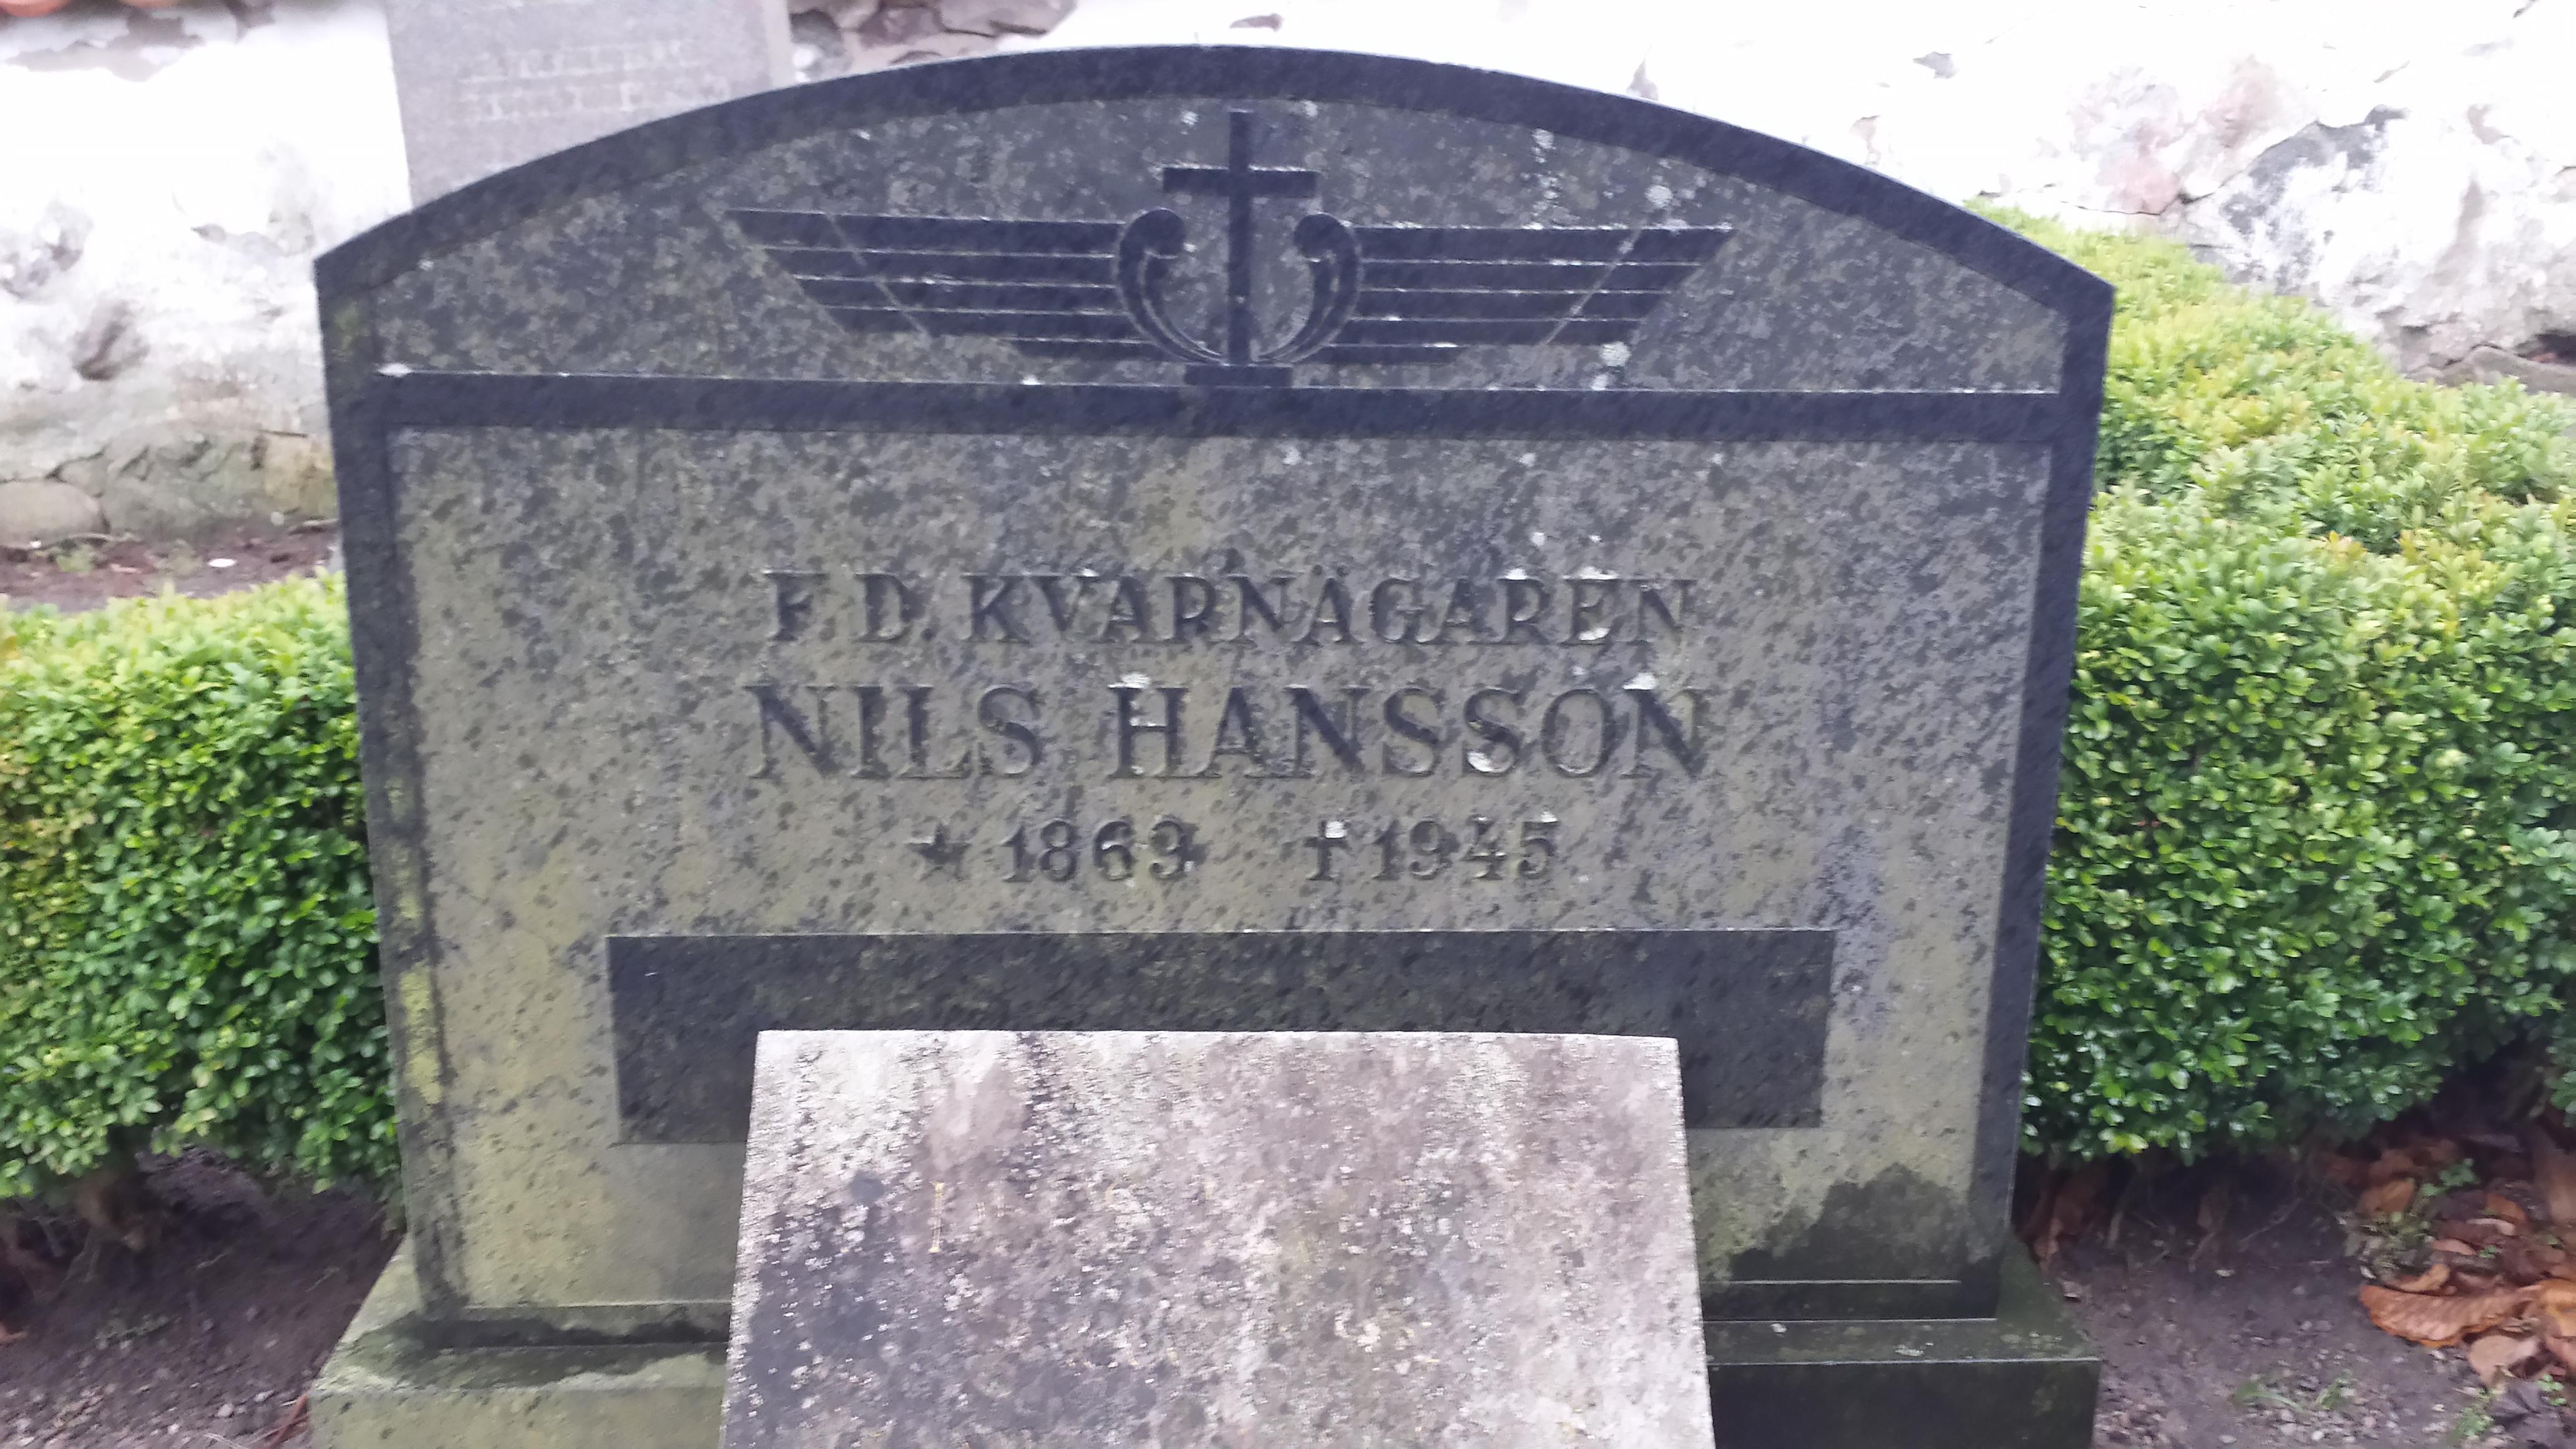 Nils Hansson